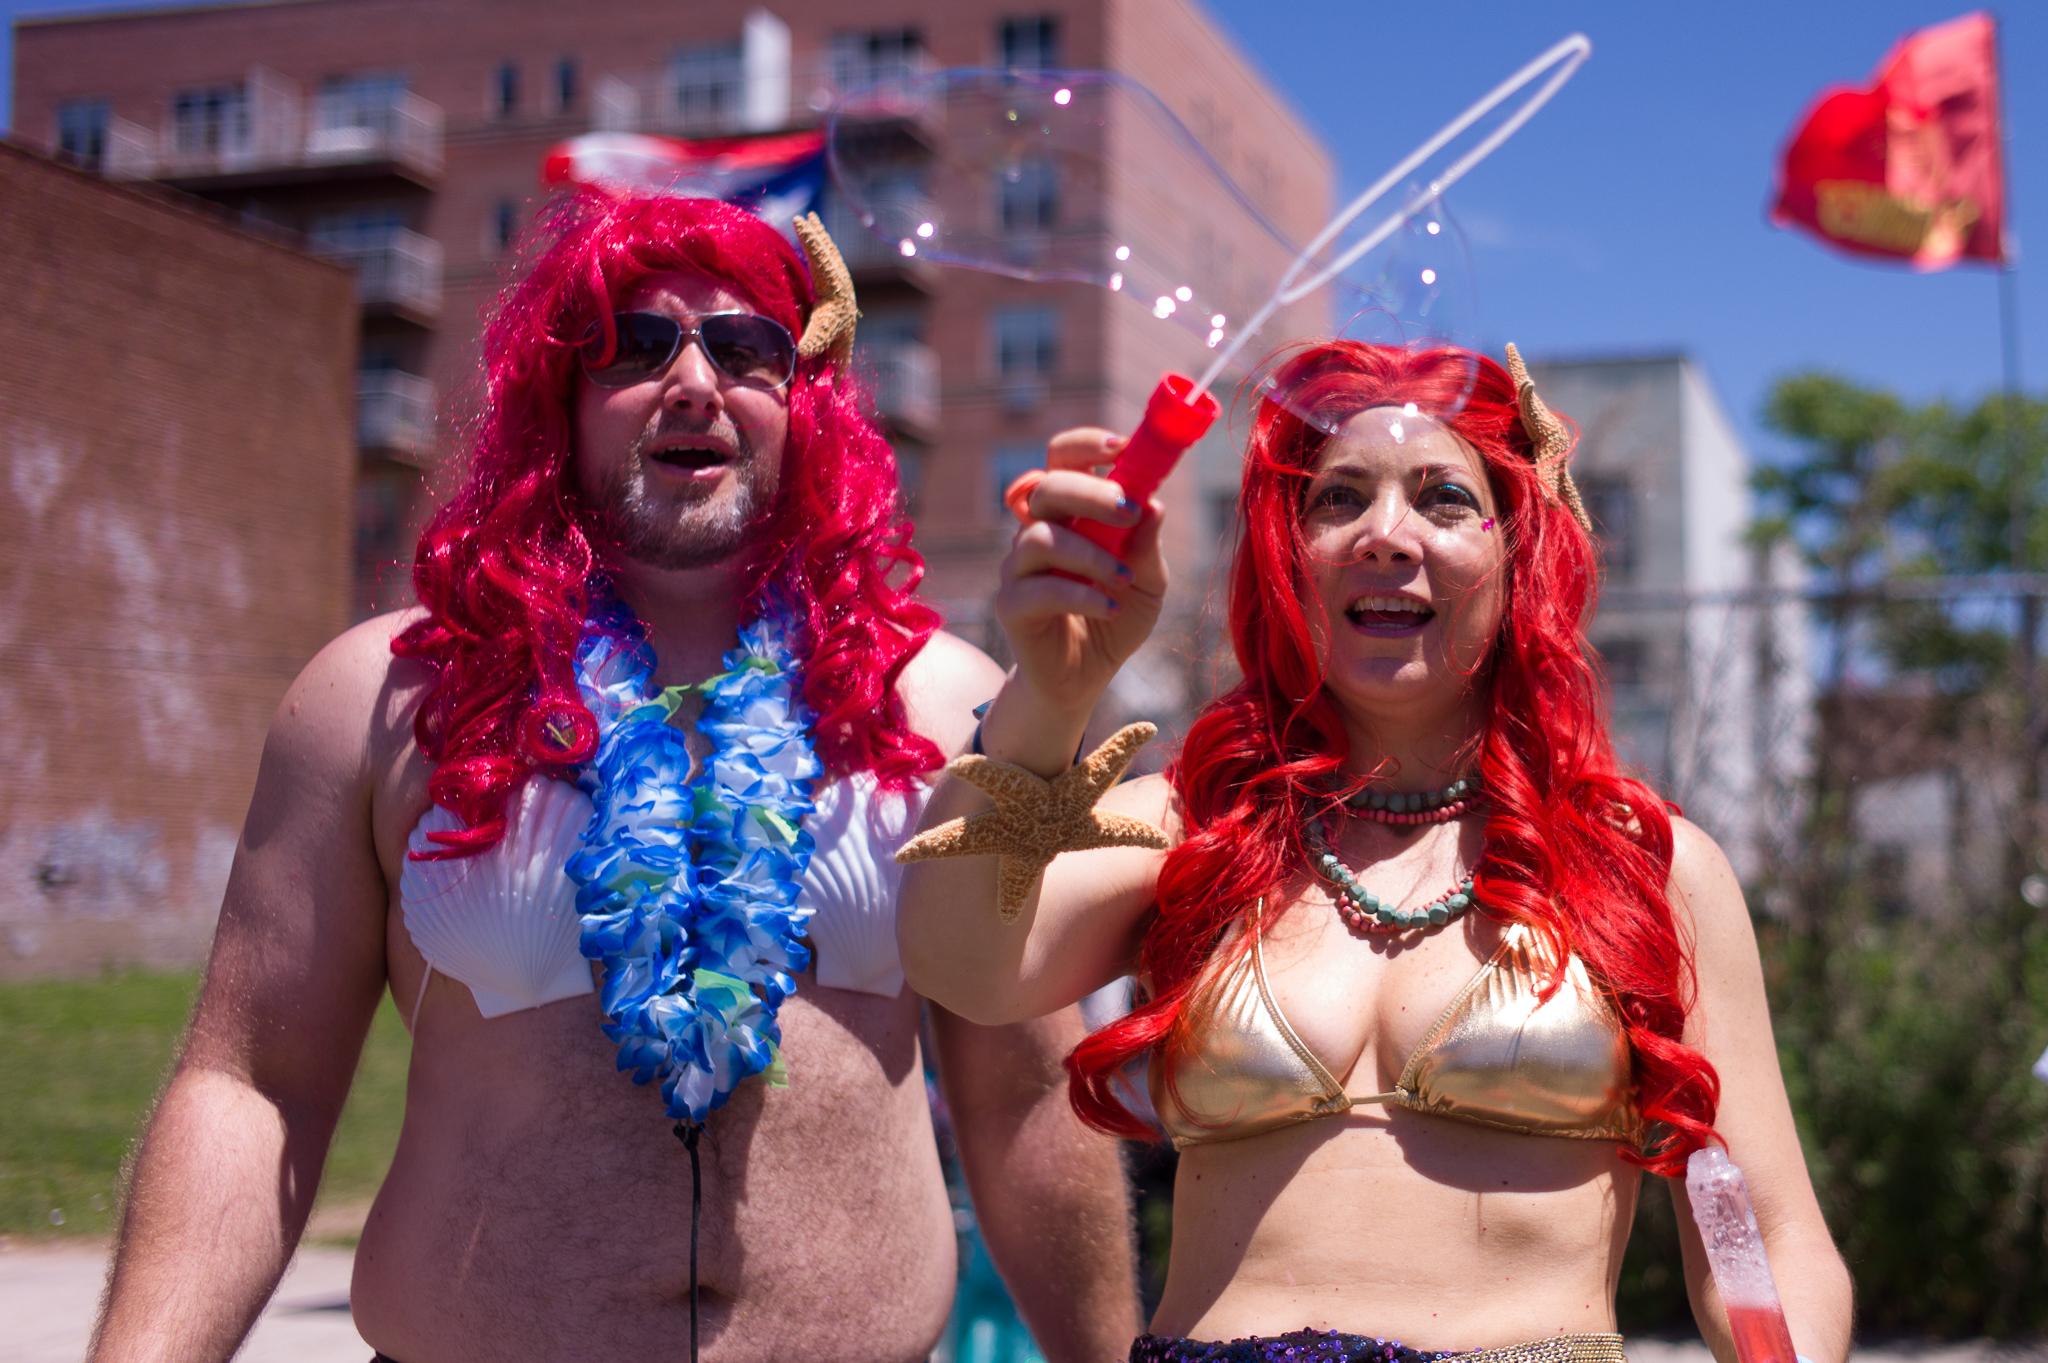 mermaid_parade_2014_019.jpg